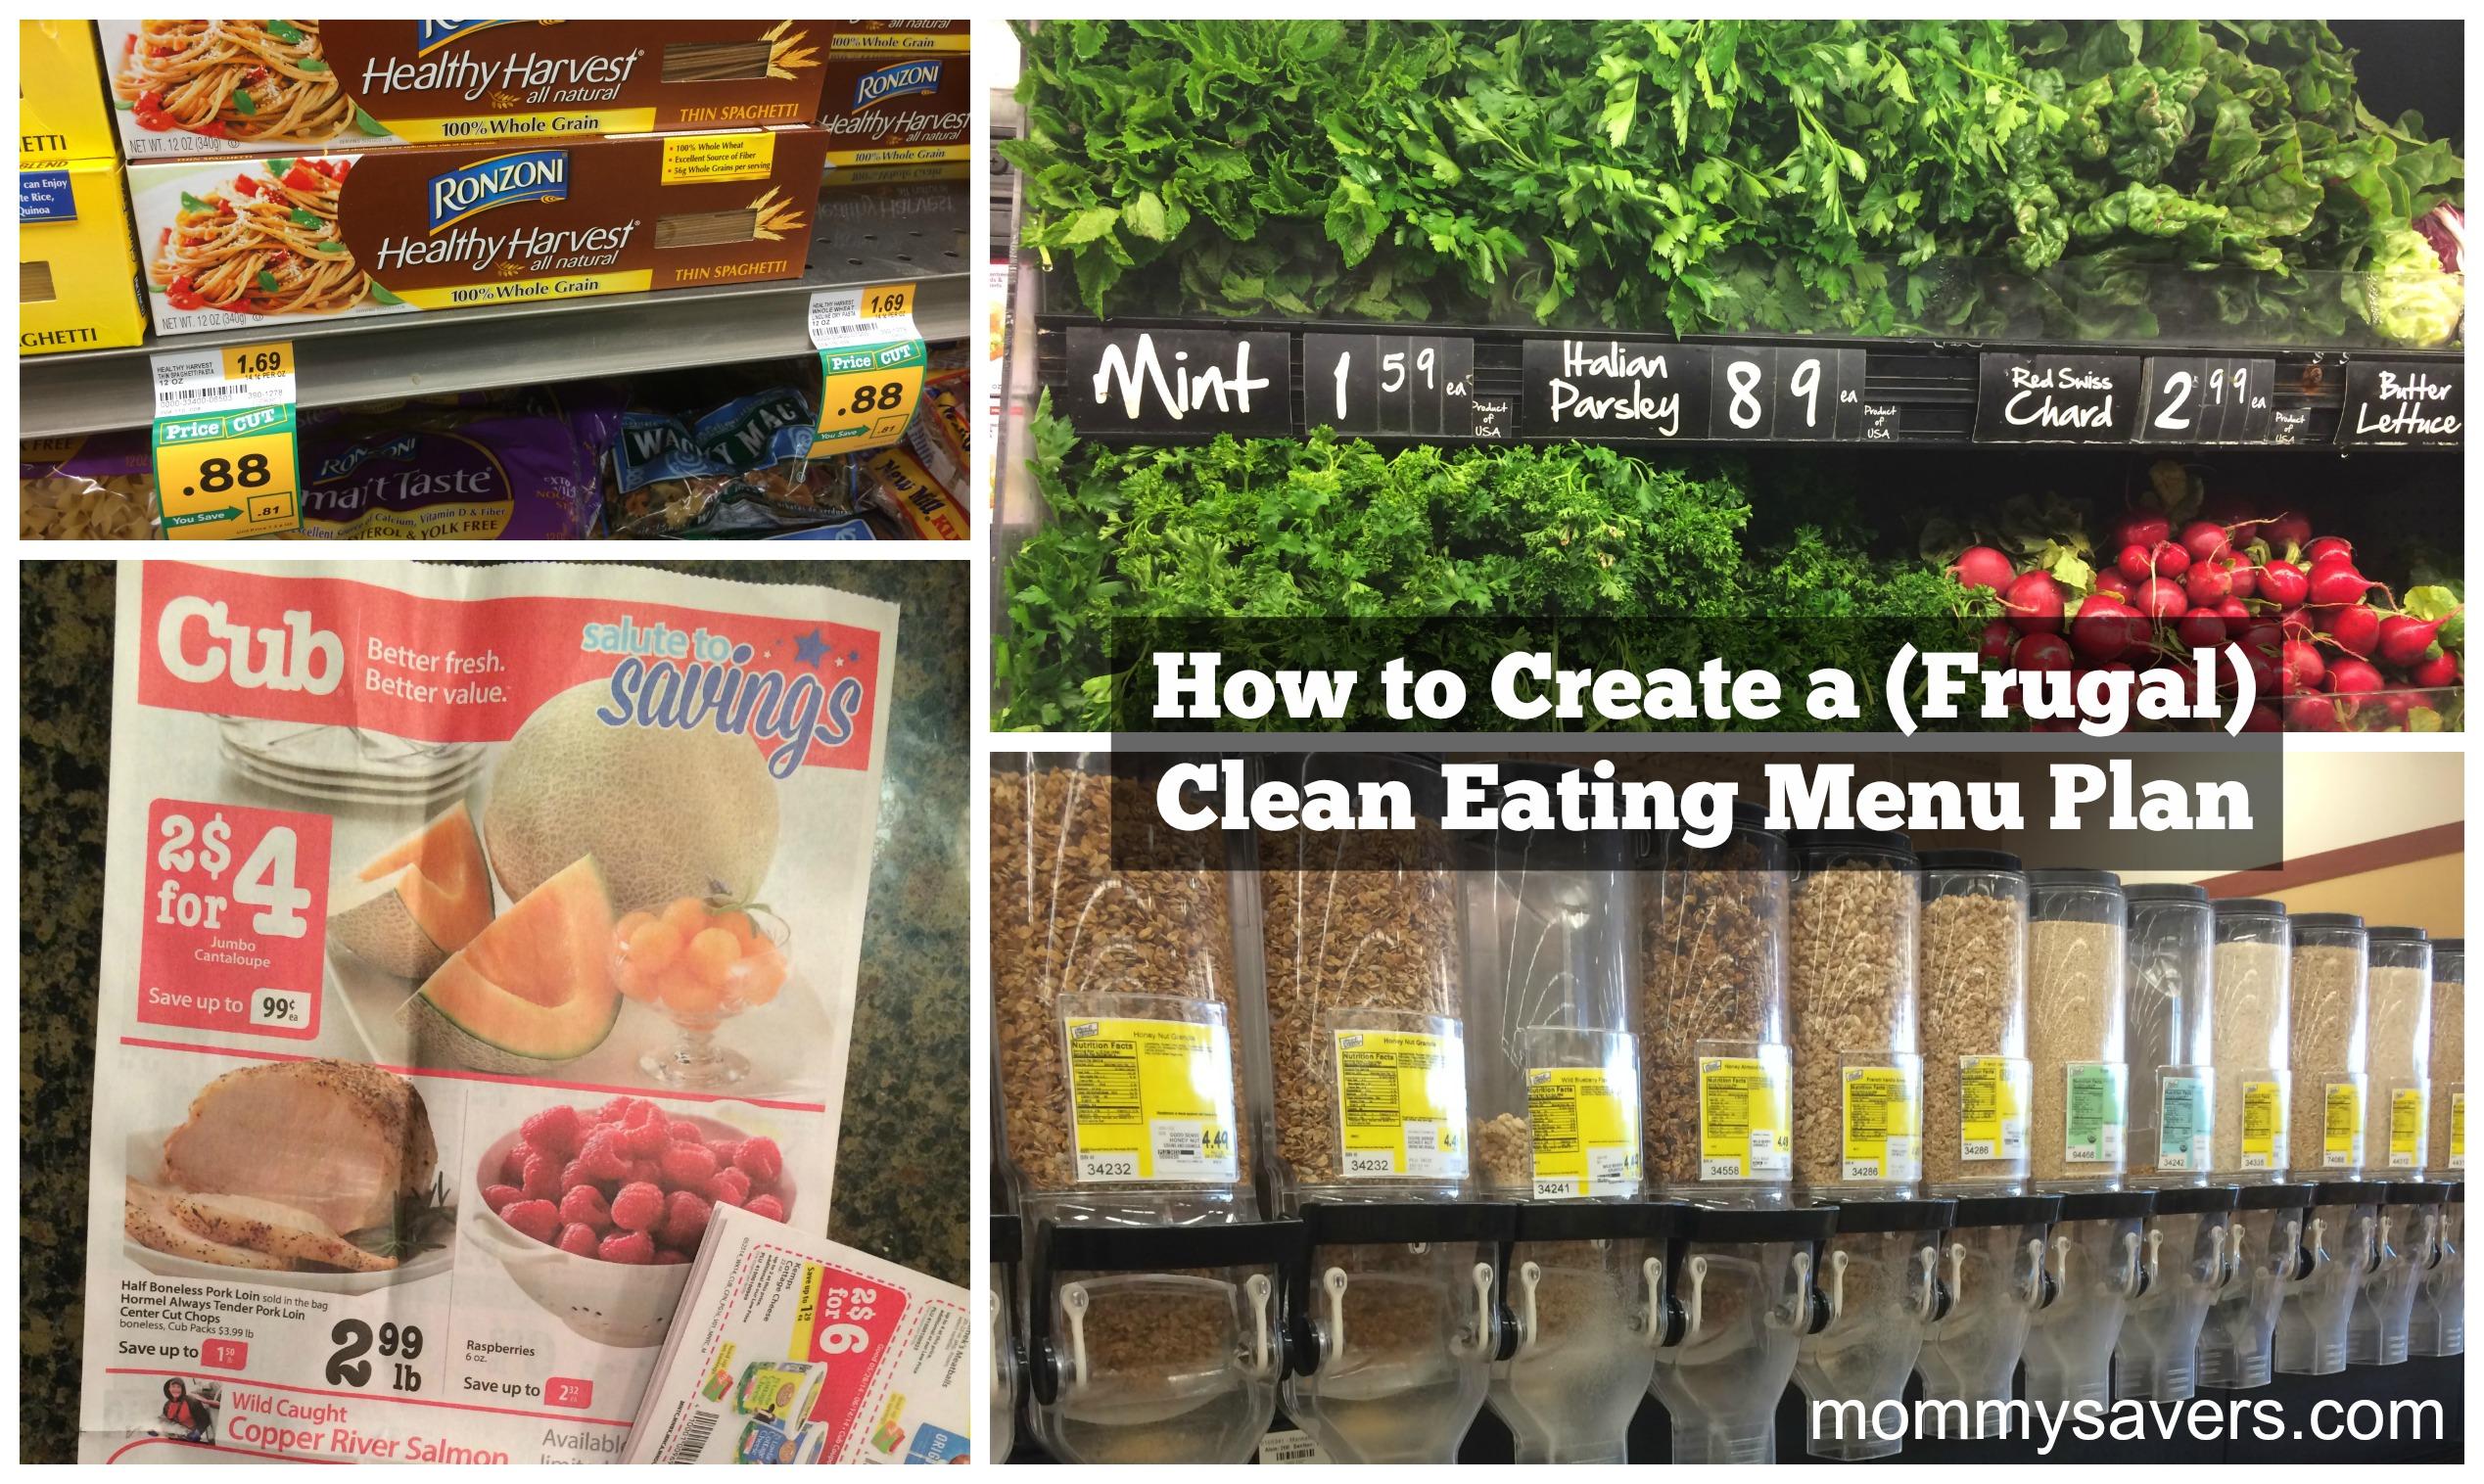 How to Create a Frugal Clean Eating Menu Plan